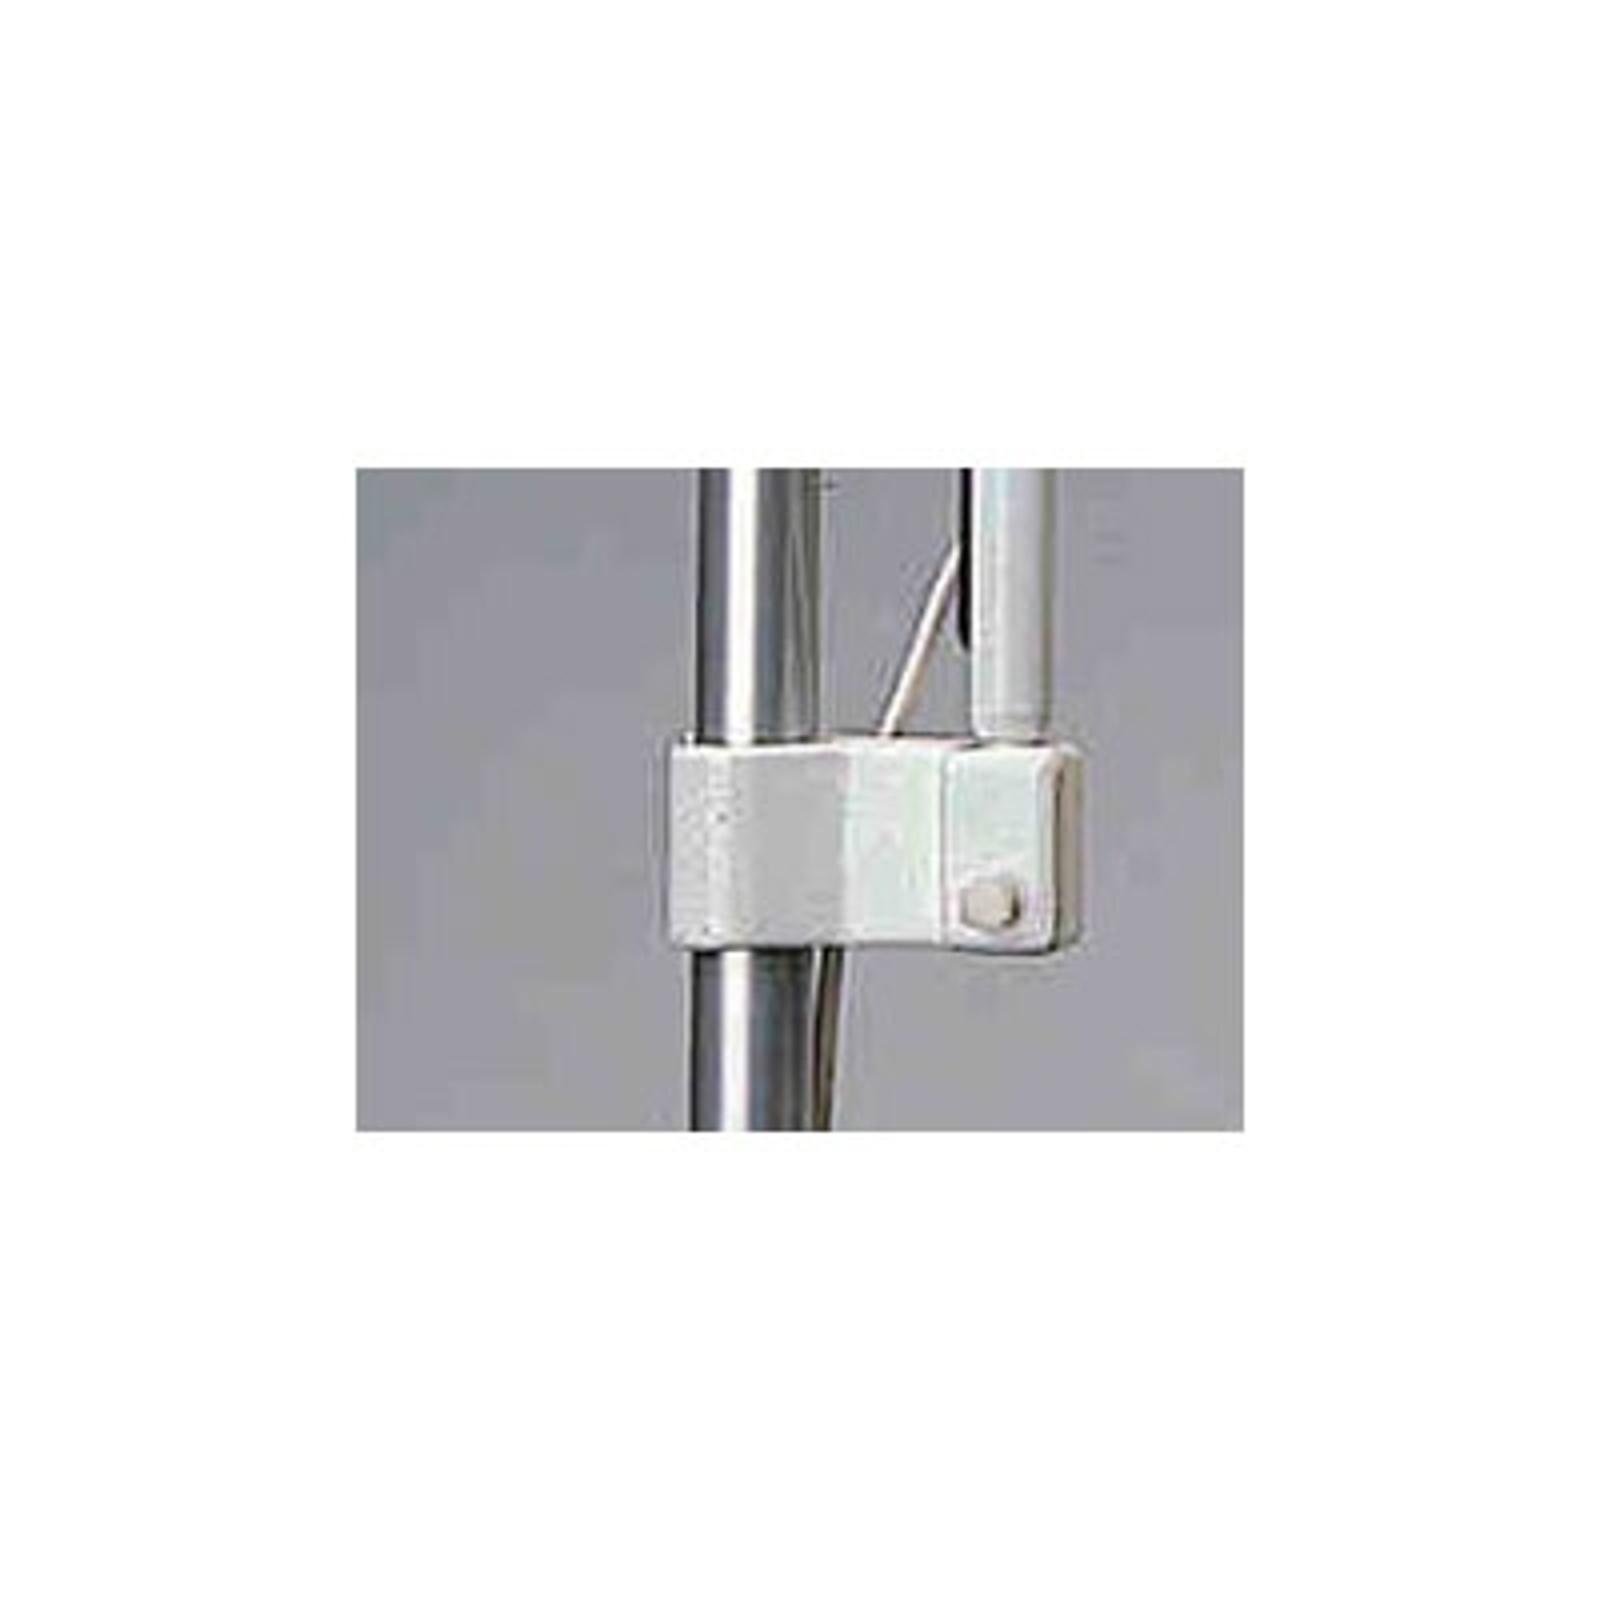 Klemme für LED-Bettleseleuchte